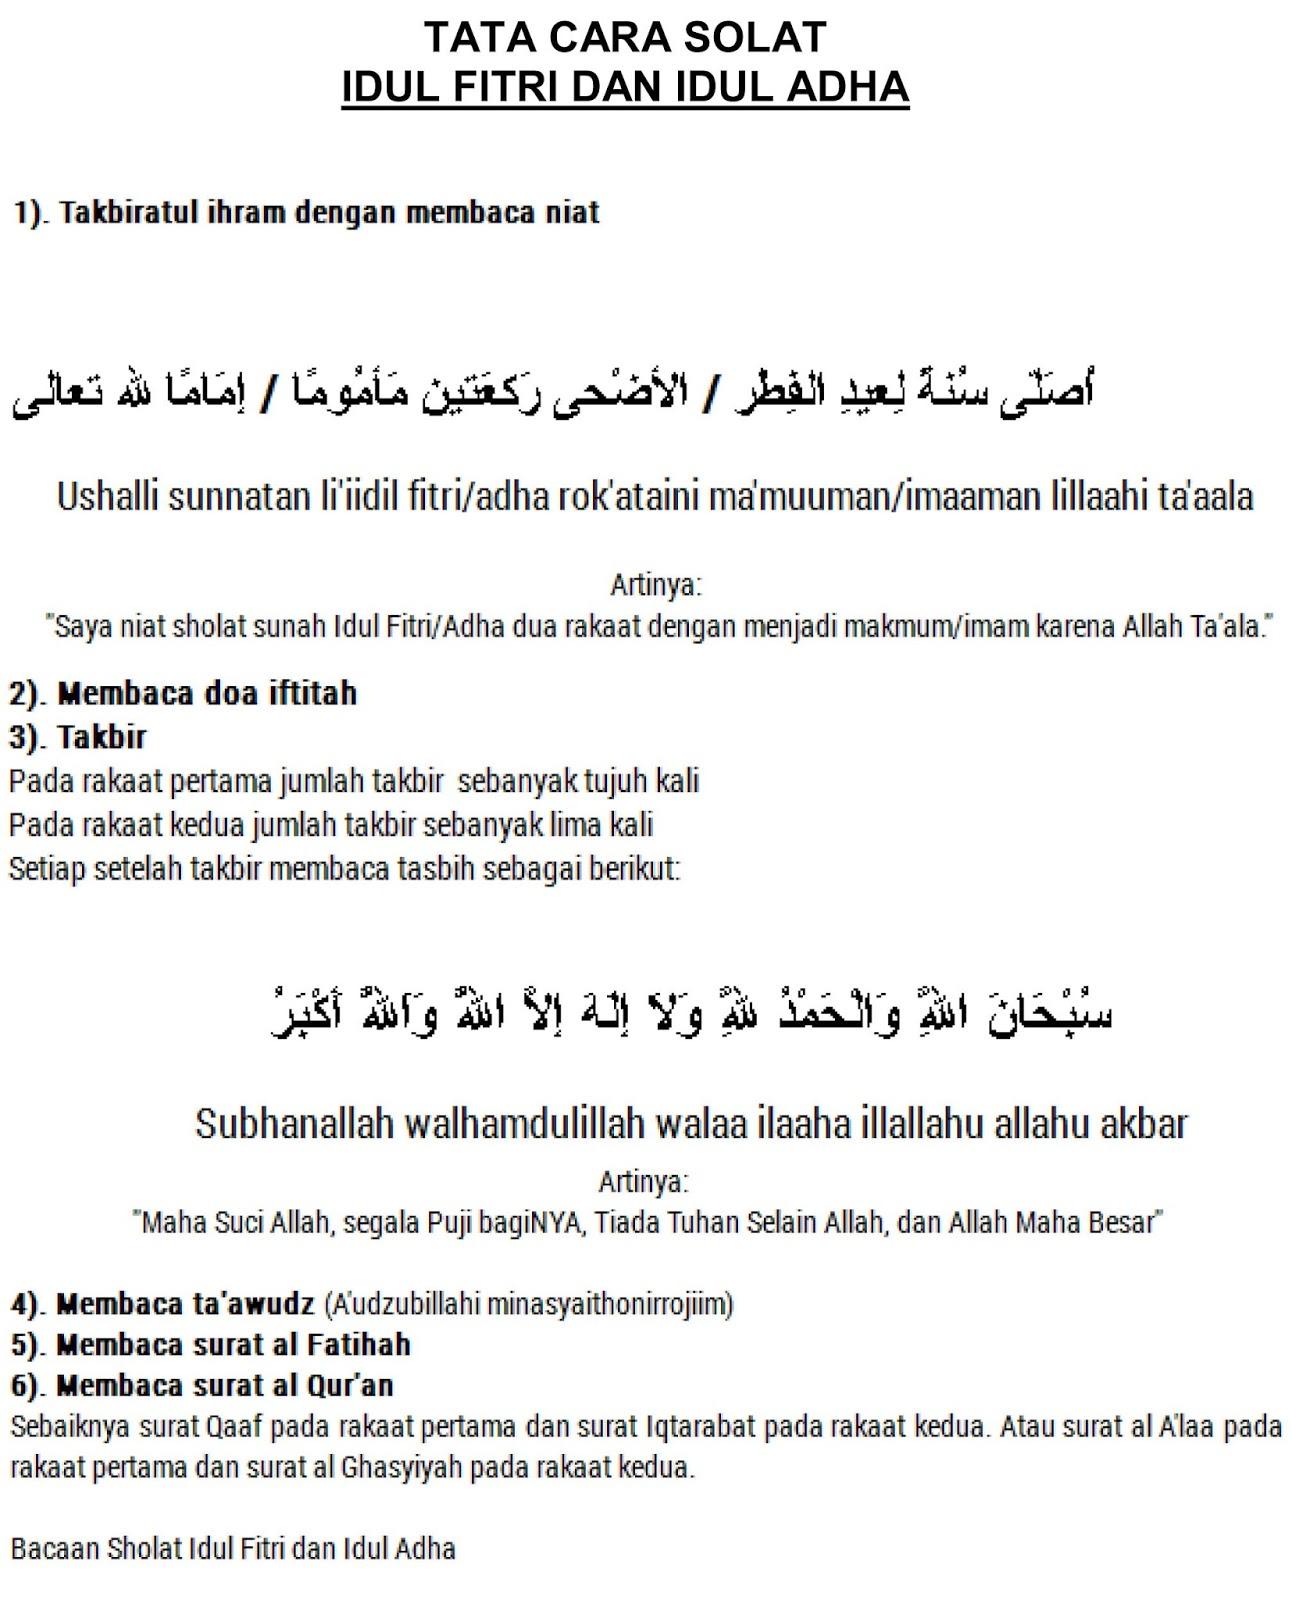 Bacaan Sholat Idul Adha